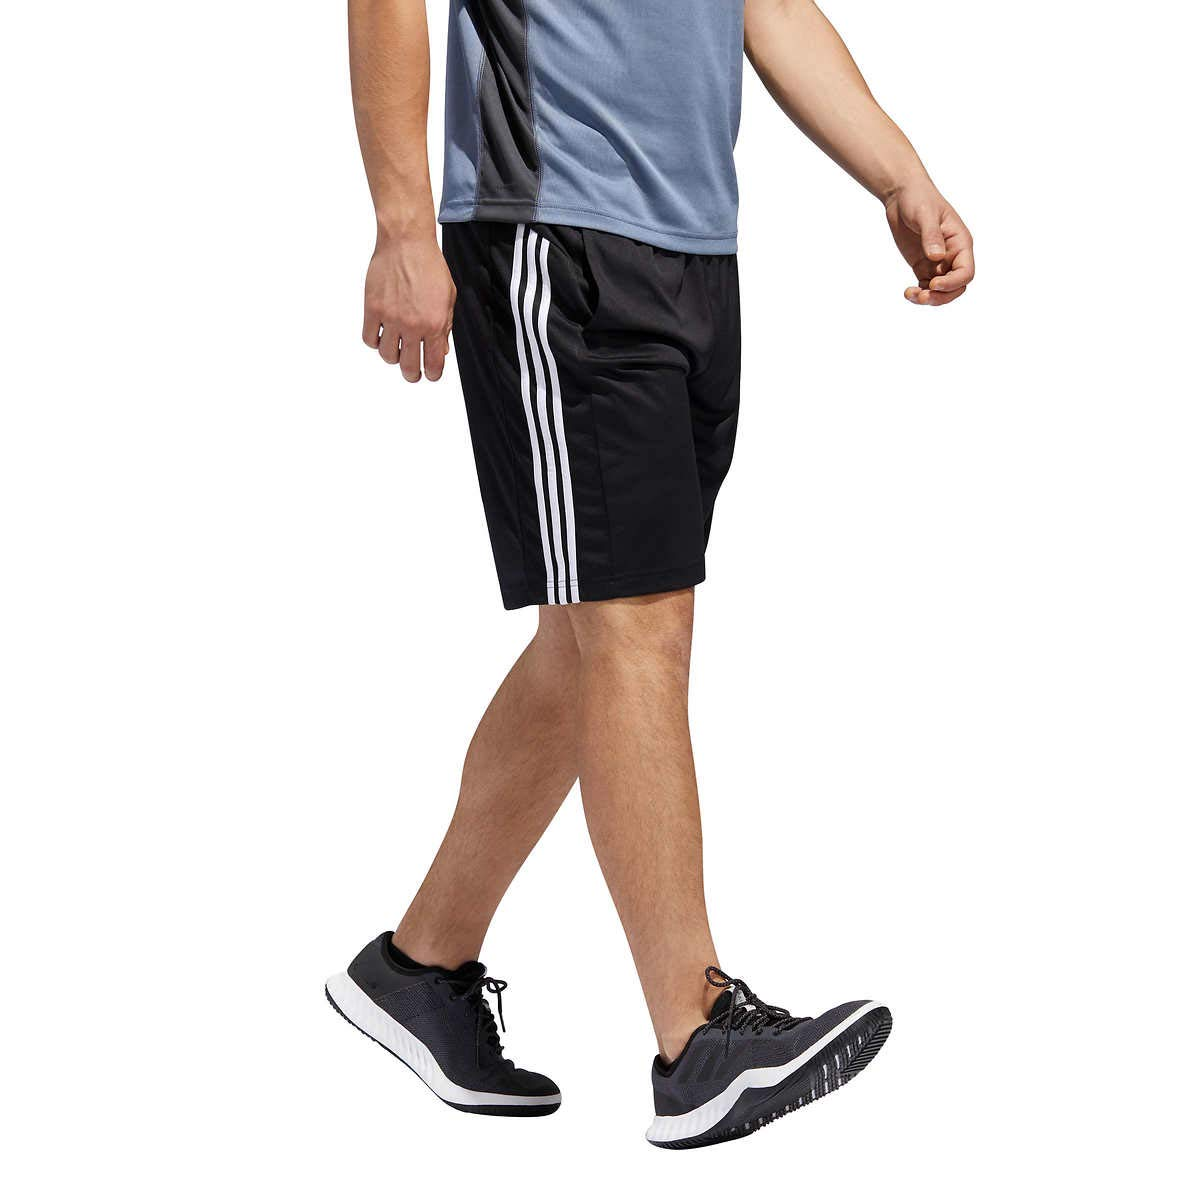 Black White XLarge Adidas Men's Active Zip Pocket Shorts